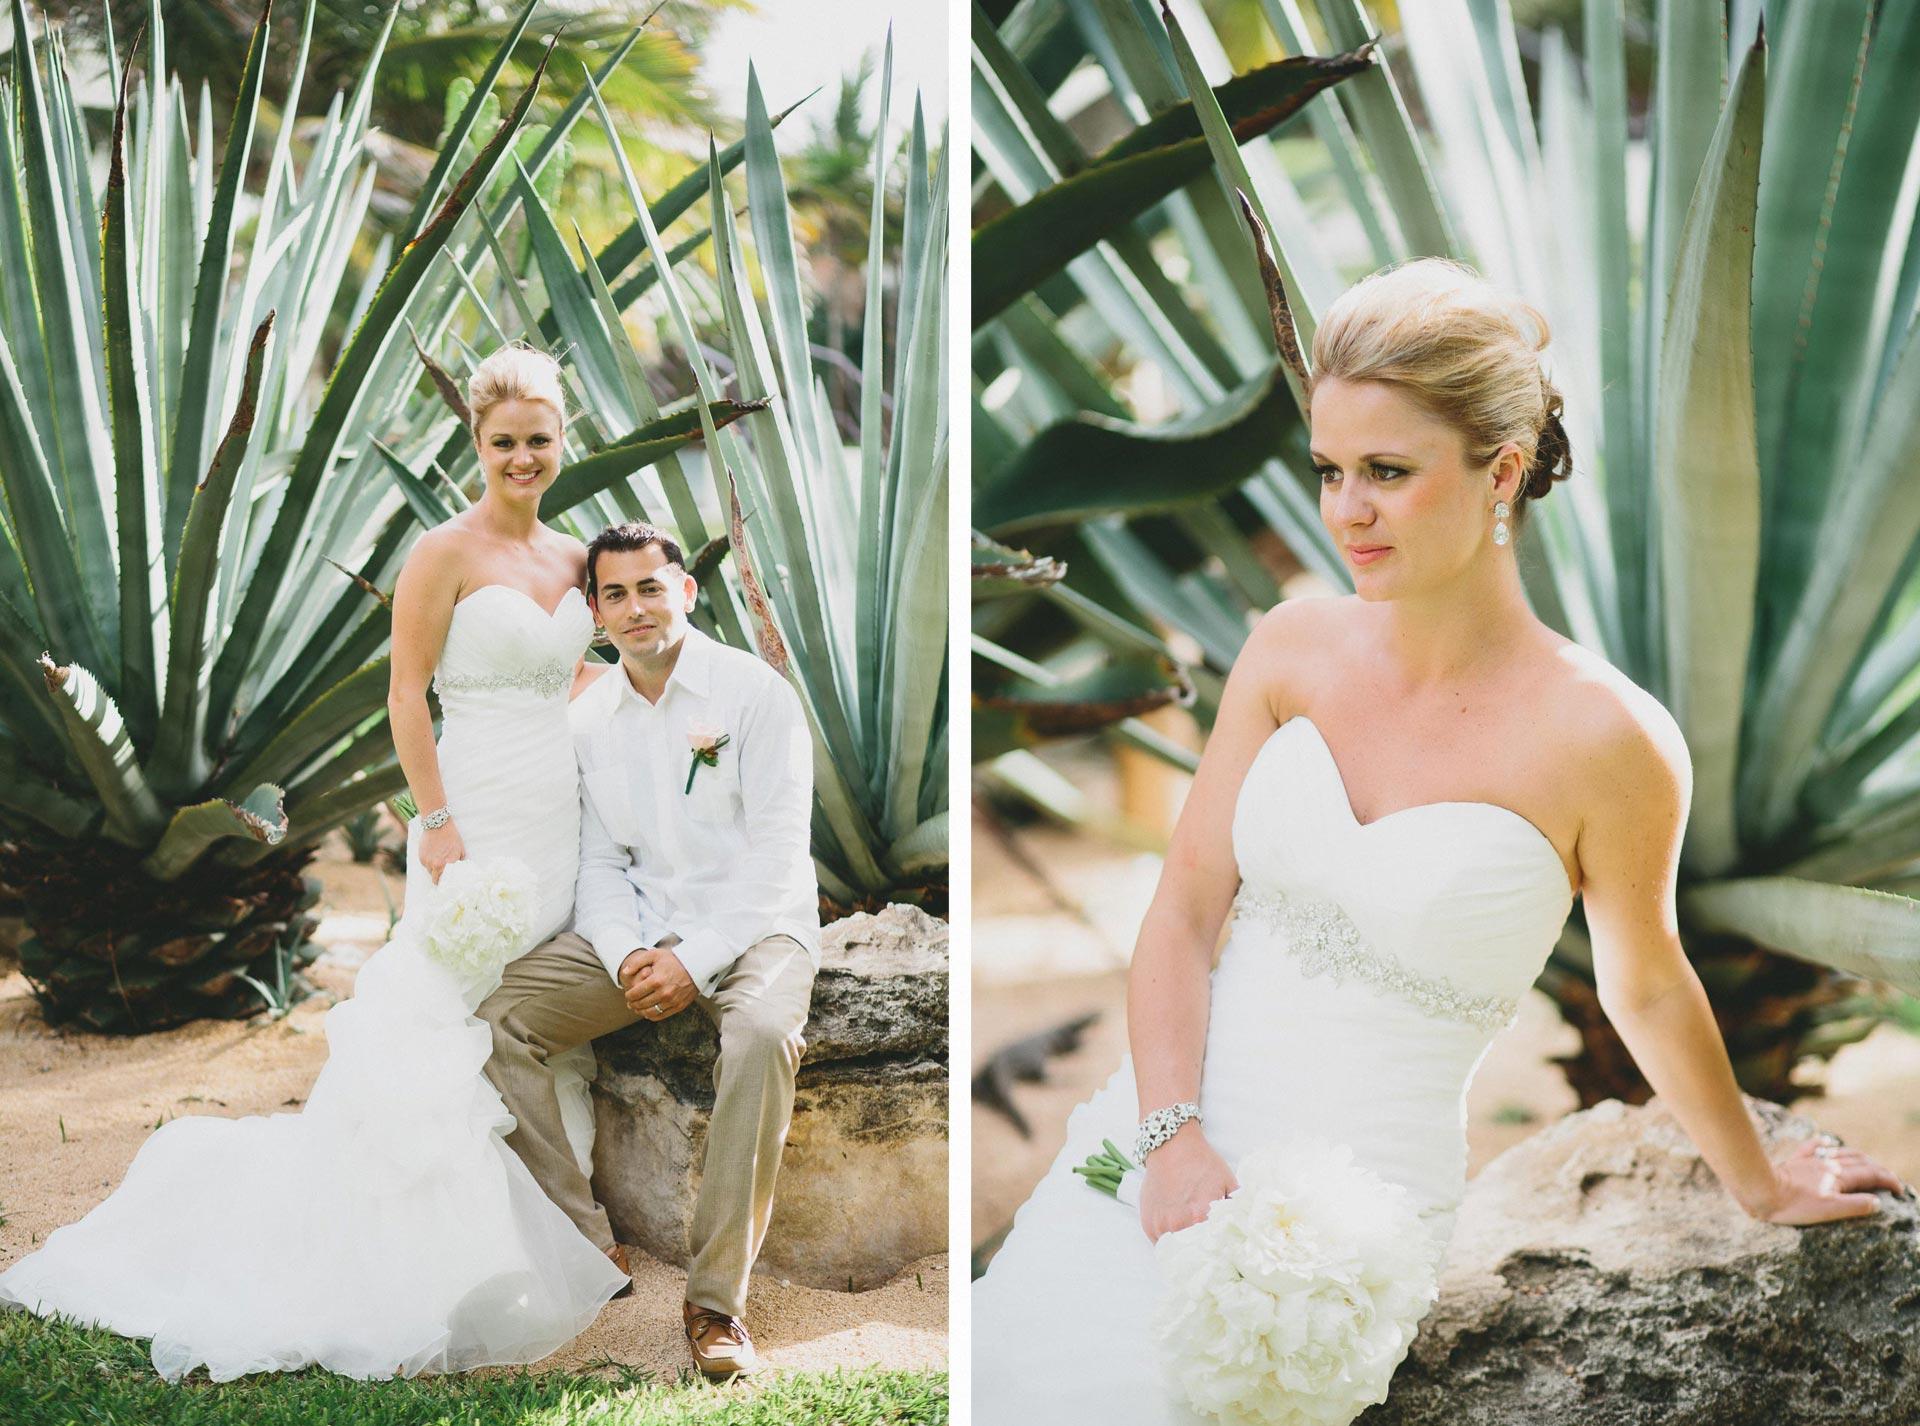 LC-Riviera-Maya-Mexico-Wedding-093@2x.jpg